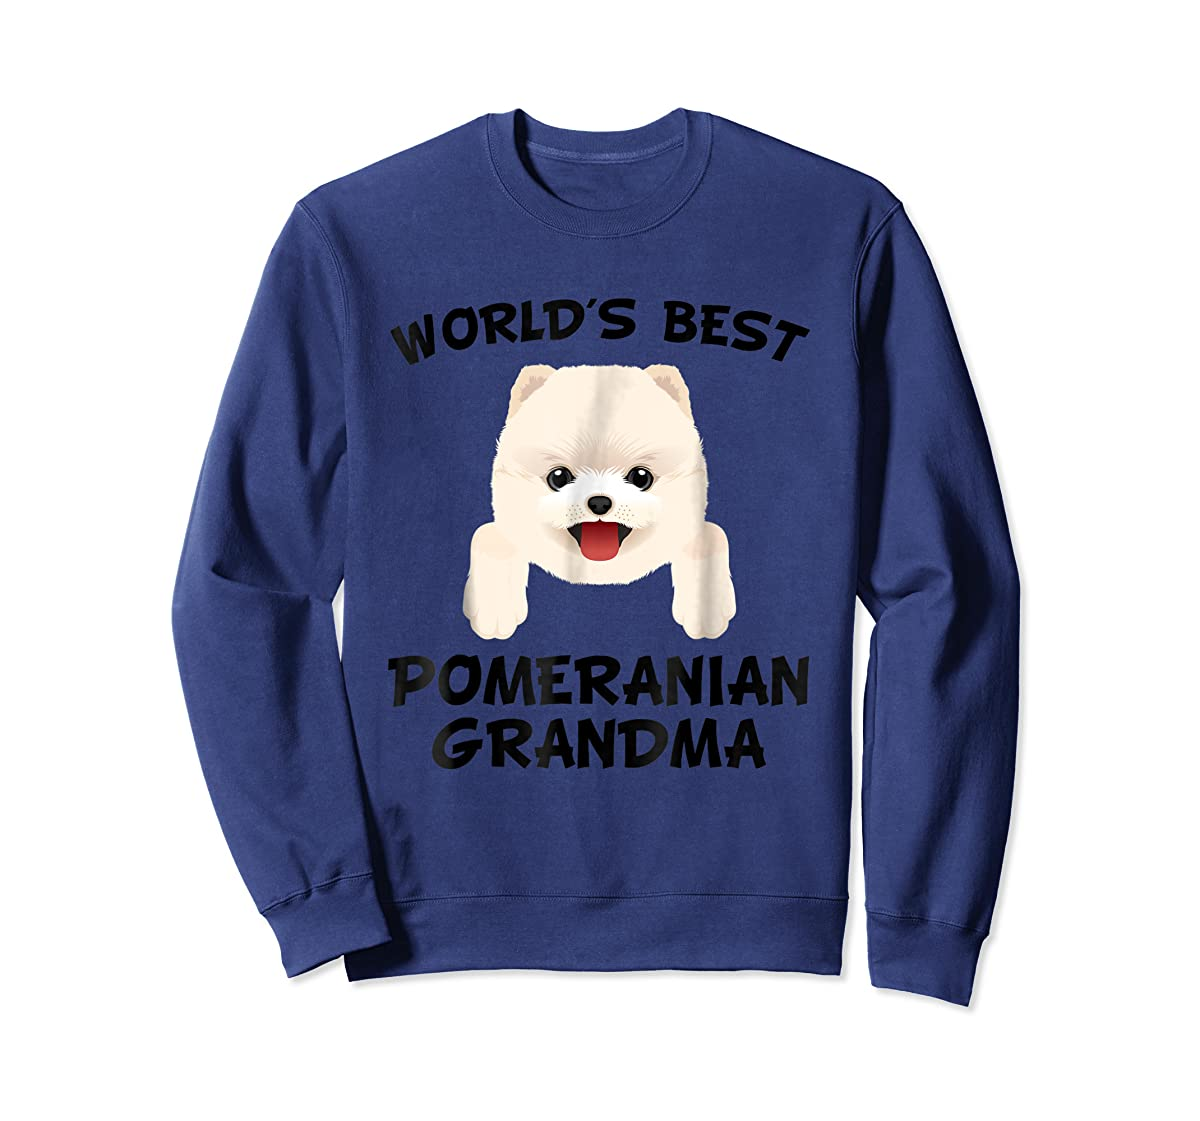 World's Best Pomeranian Grandma Dog Granddog T-Shirt-Sweatshirt-Navy